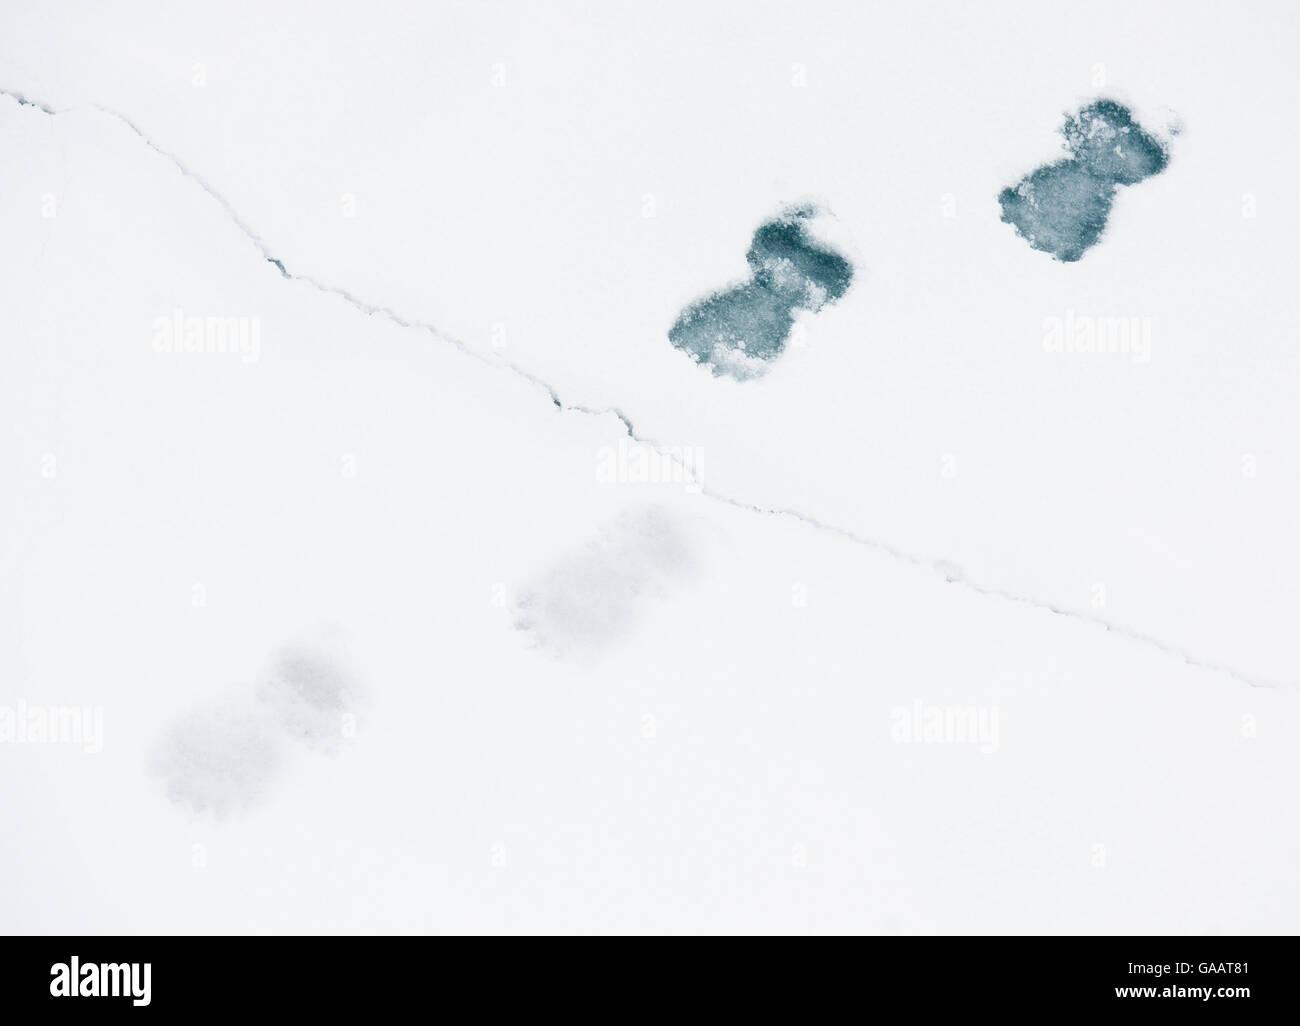 Polar bear (Ursus maritimus) footprints in snow, on cracked ice, Svalbard, Norway, September. - Stock Image